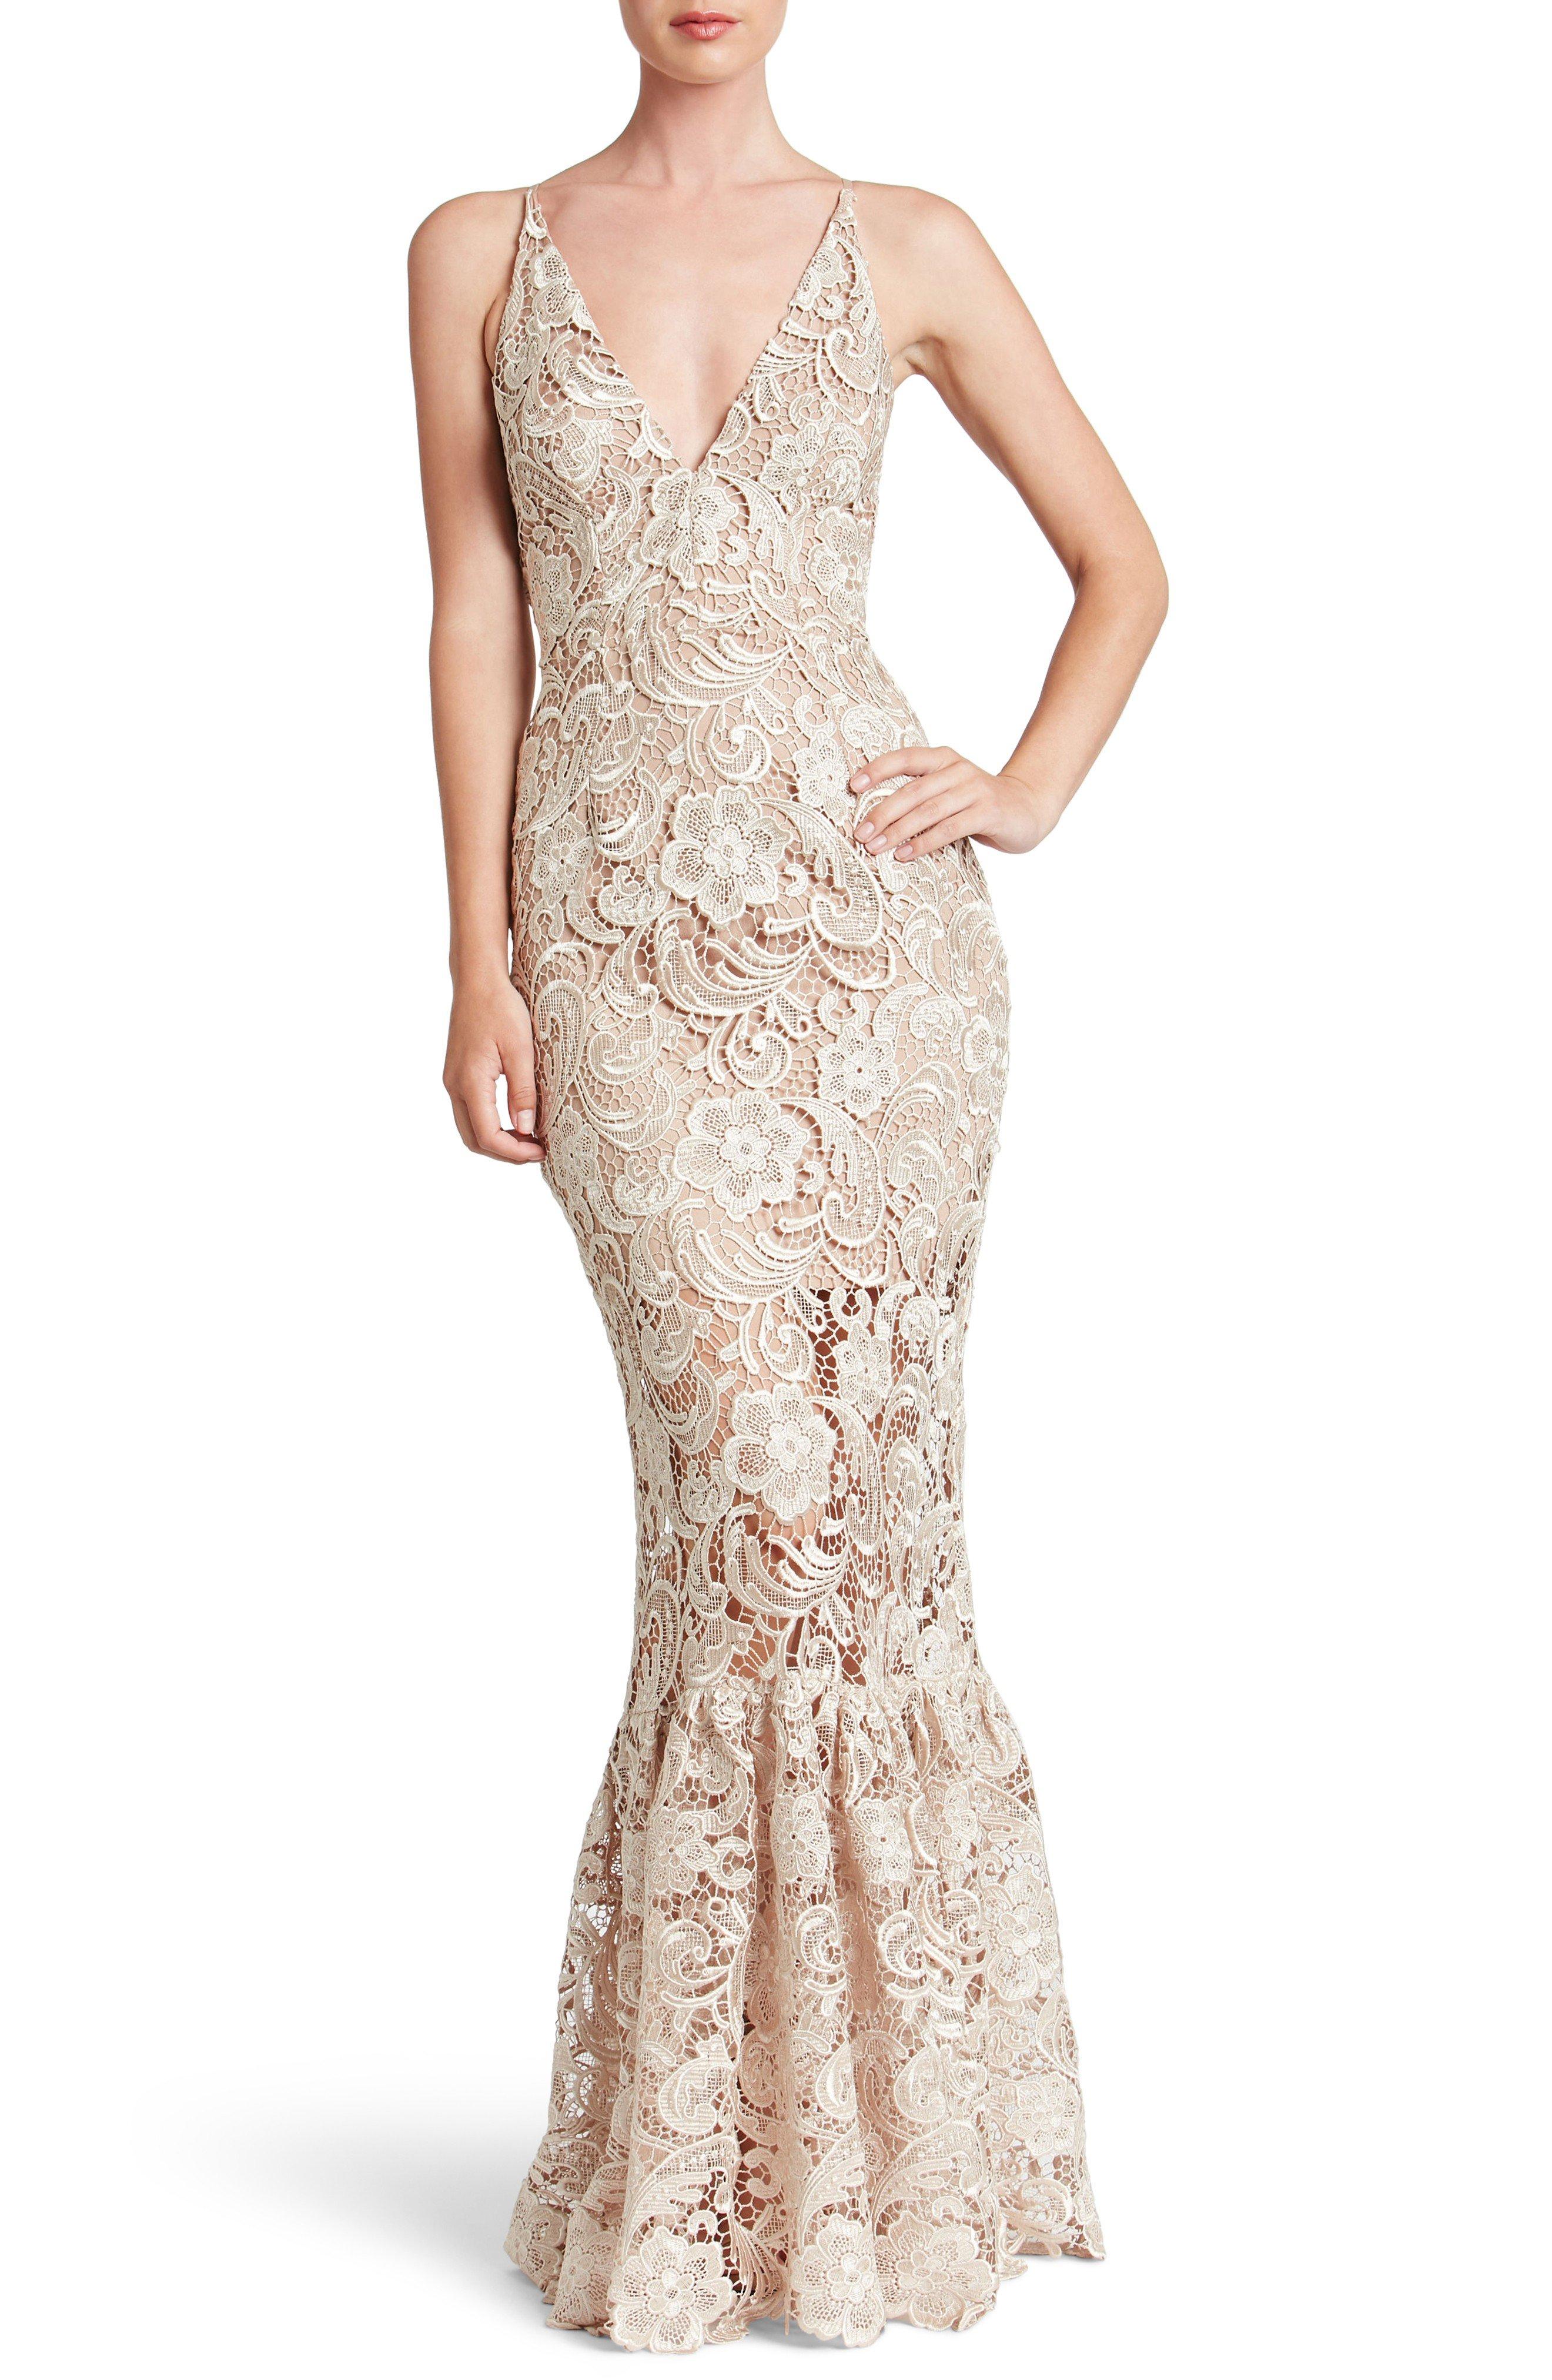 add8ec18 DRESS THE POPULATION Sophia Crochet Lace Mermaid Cream Gown - We ...